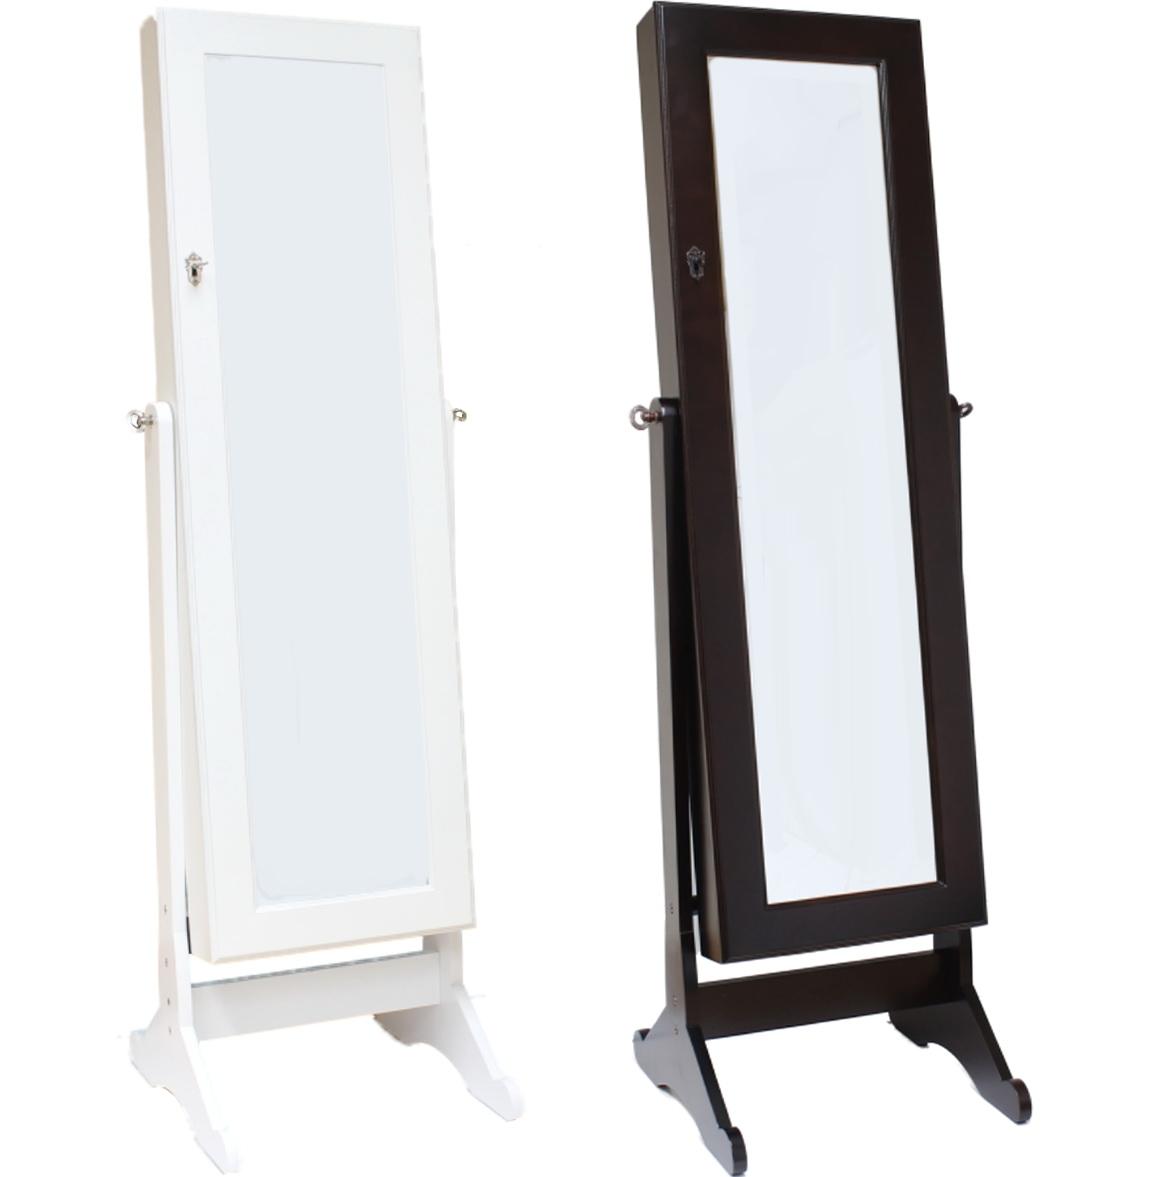 Stand Alone Floor Mirror